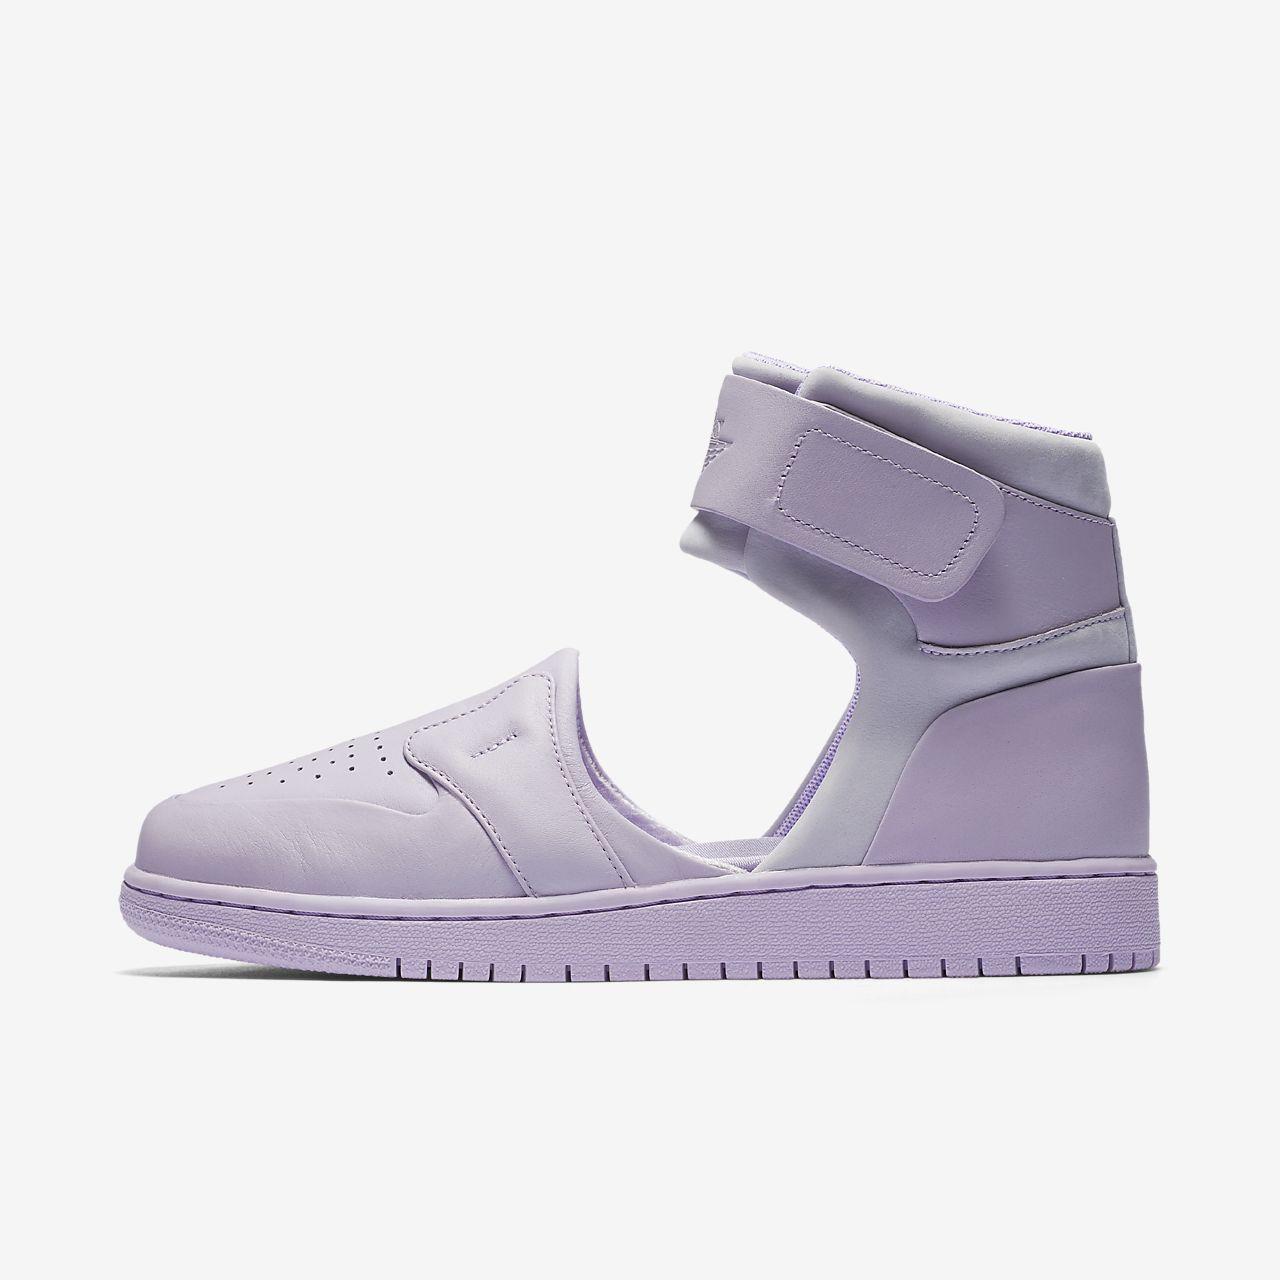 c5ff6a6c183 Jordan AJ1 Lover XX Women's Shoe. Nike.com CA